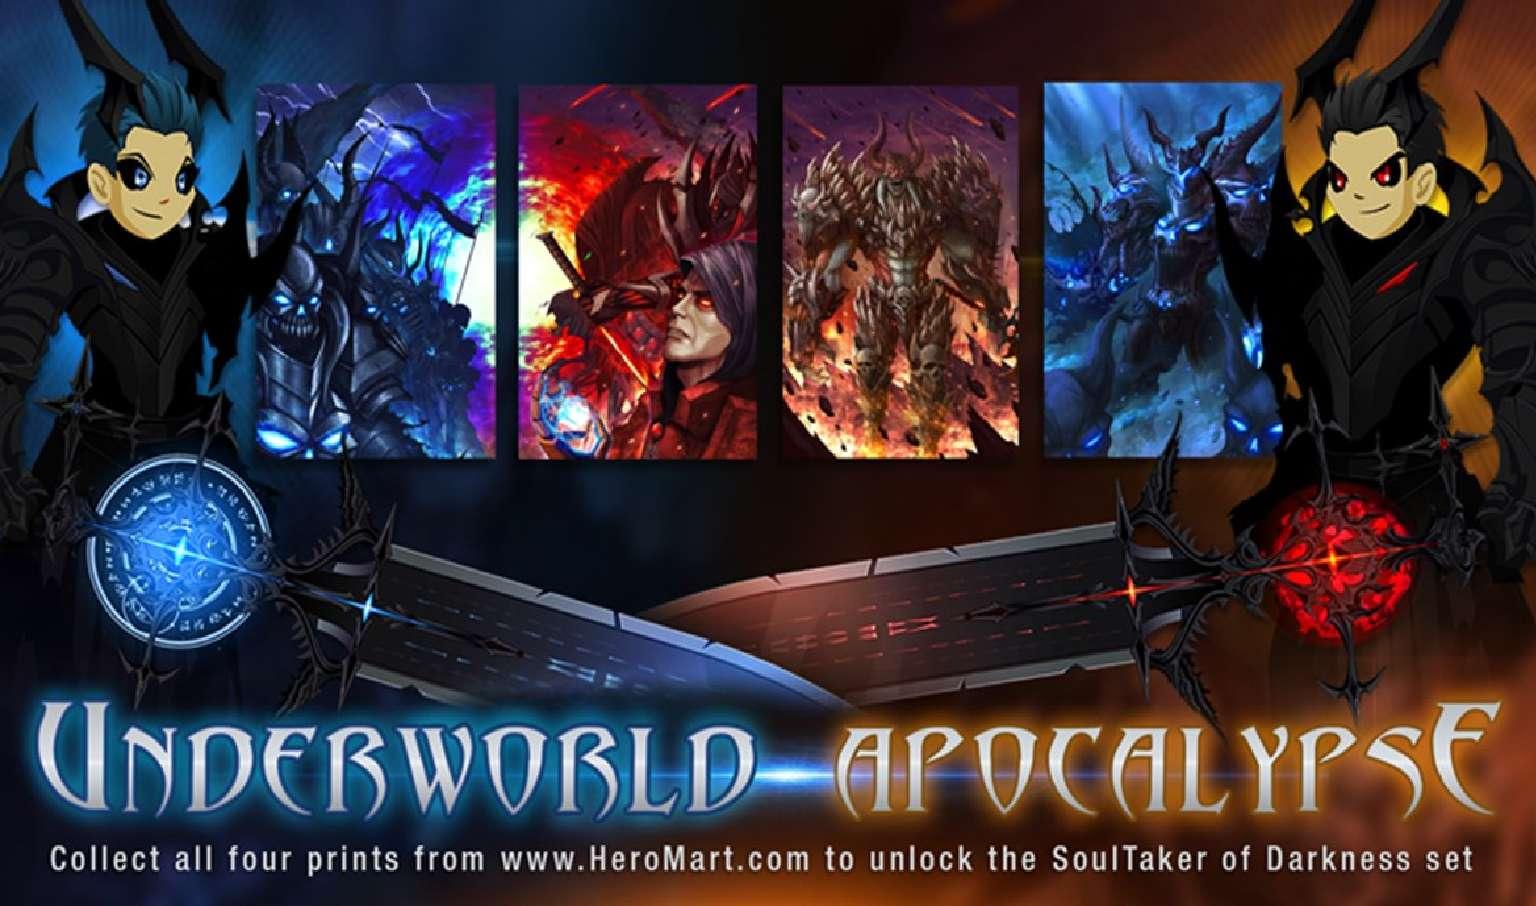 Artix Entertainment Celebrates The Birthday Of One Of Their Staff In AdventureQuest Worlds